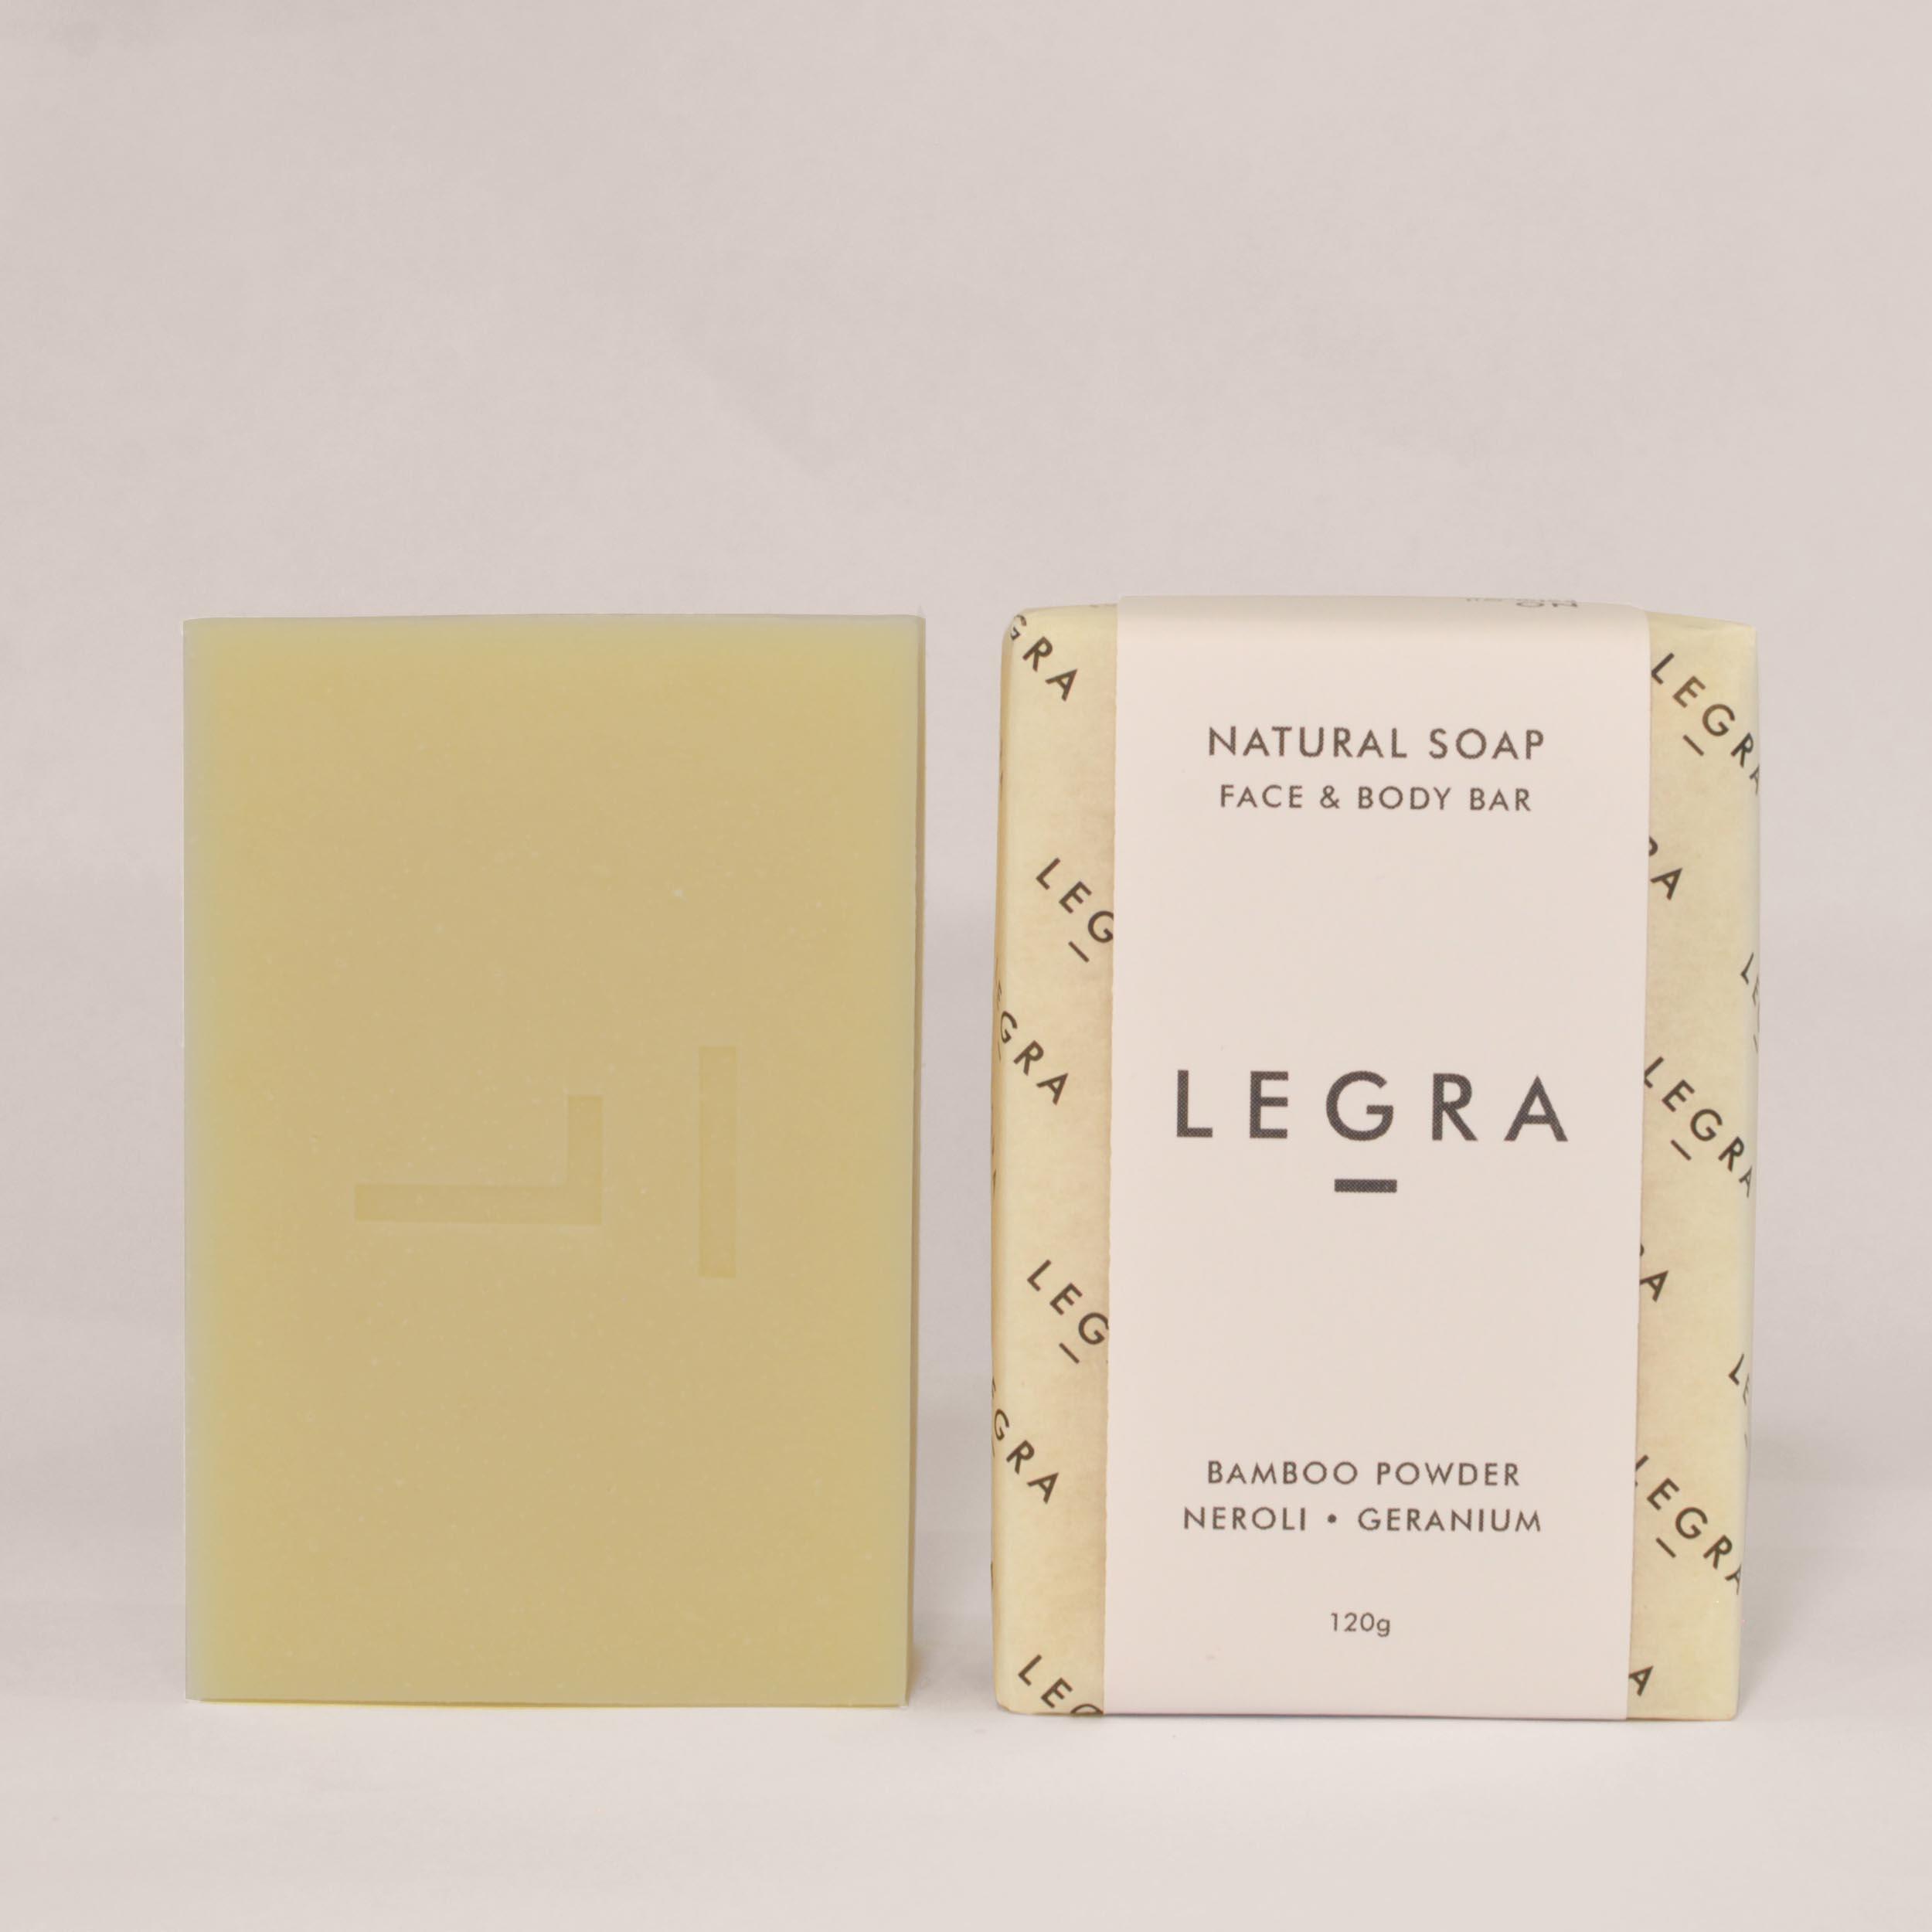 Kaolin Clay & Bamboo Powder Soap with Neroli, Geranium & Fennel